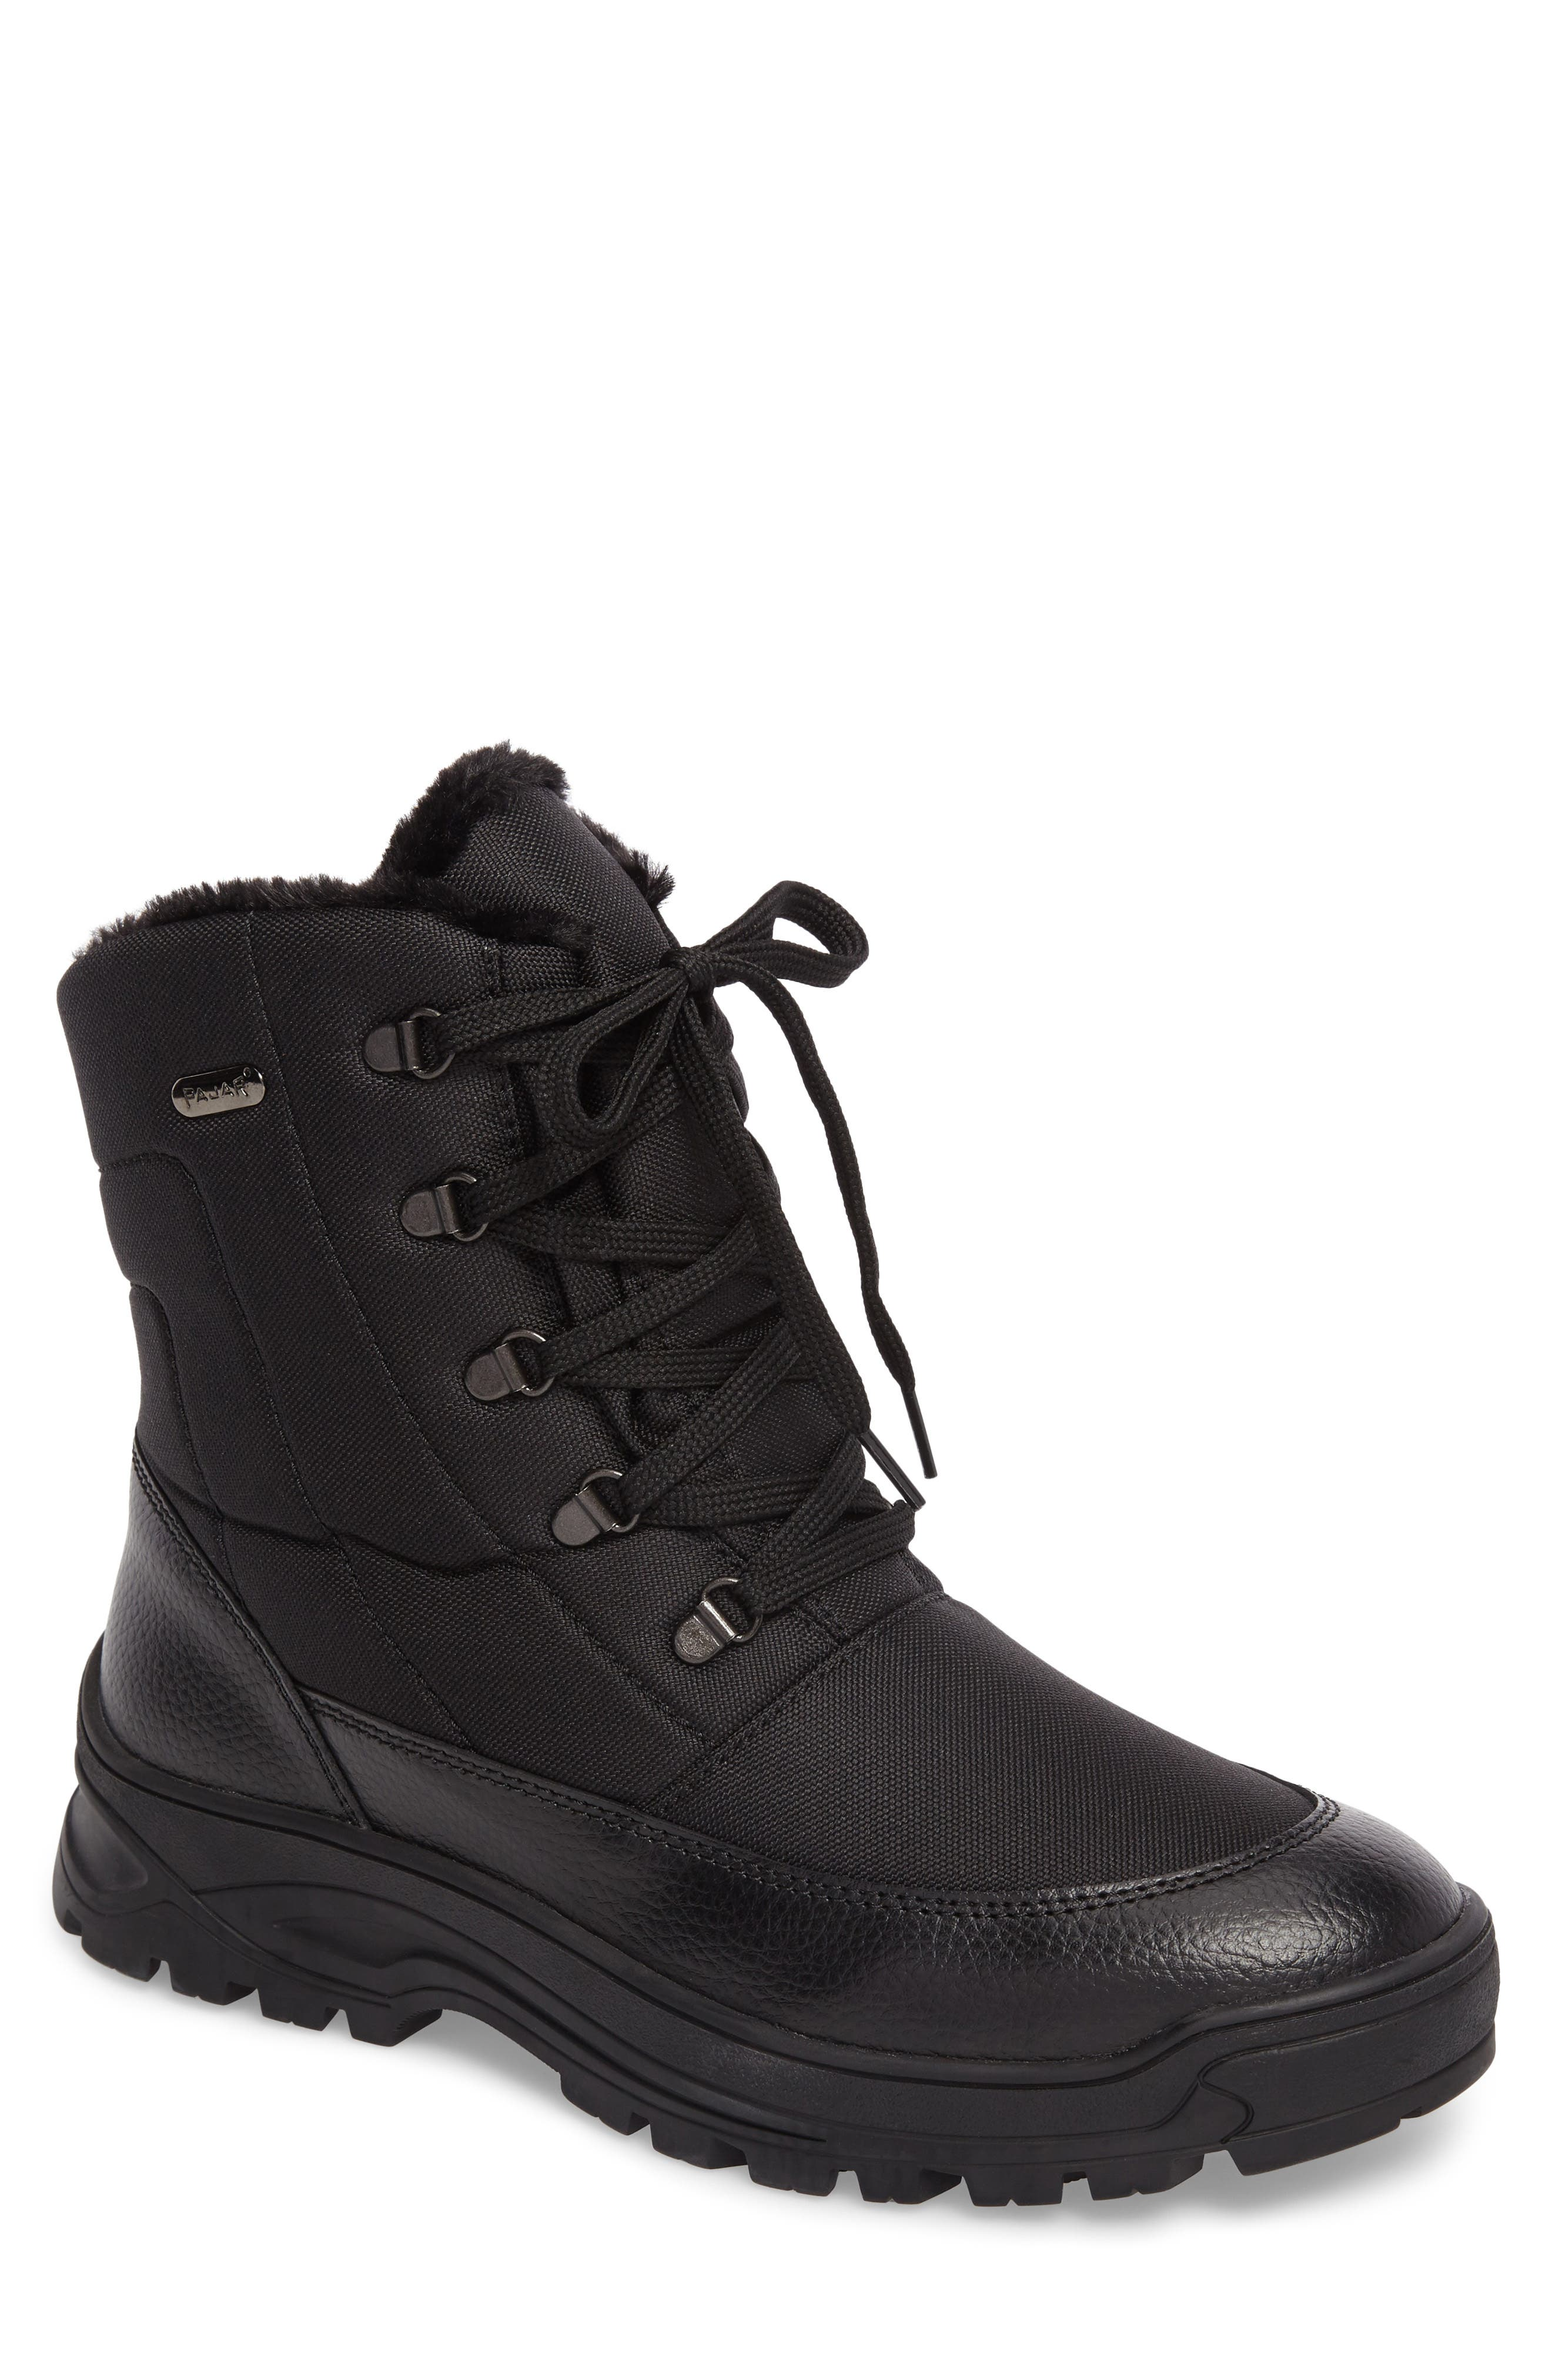 Trigger Winter Boot,                             Main thumbnail 1, color,                             Black